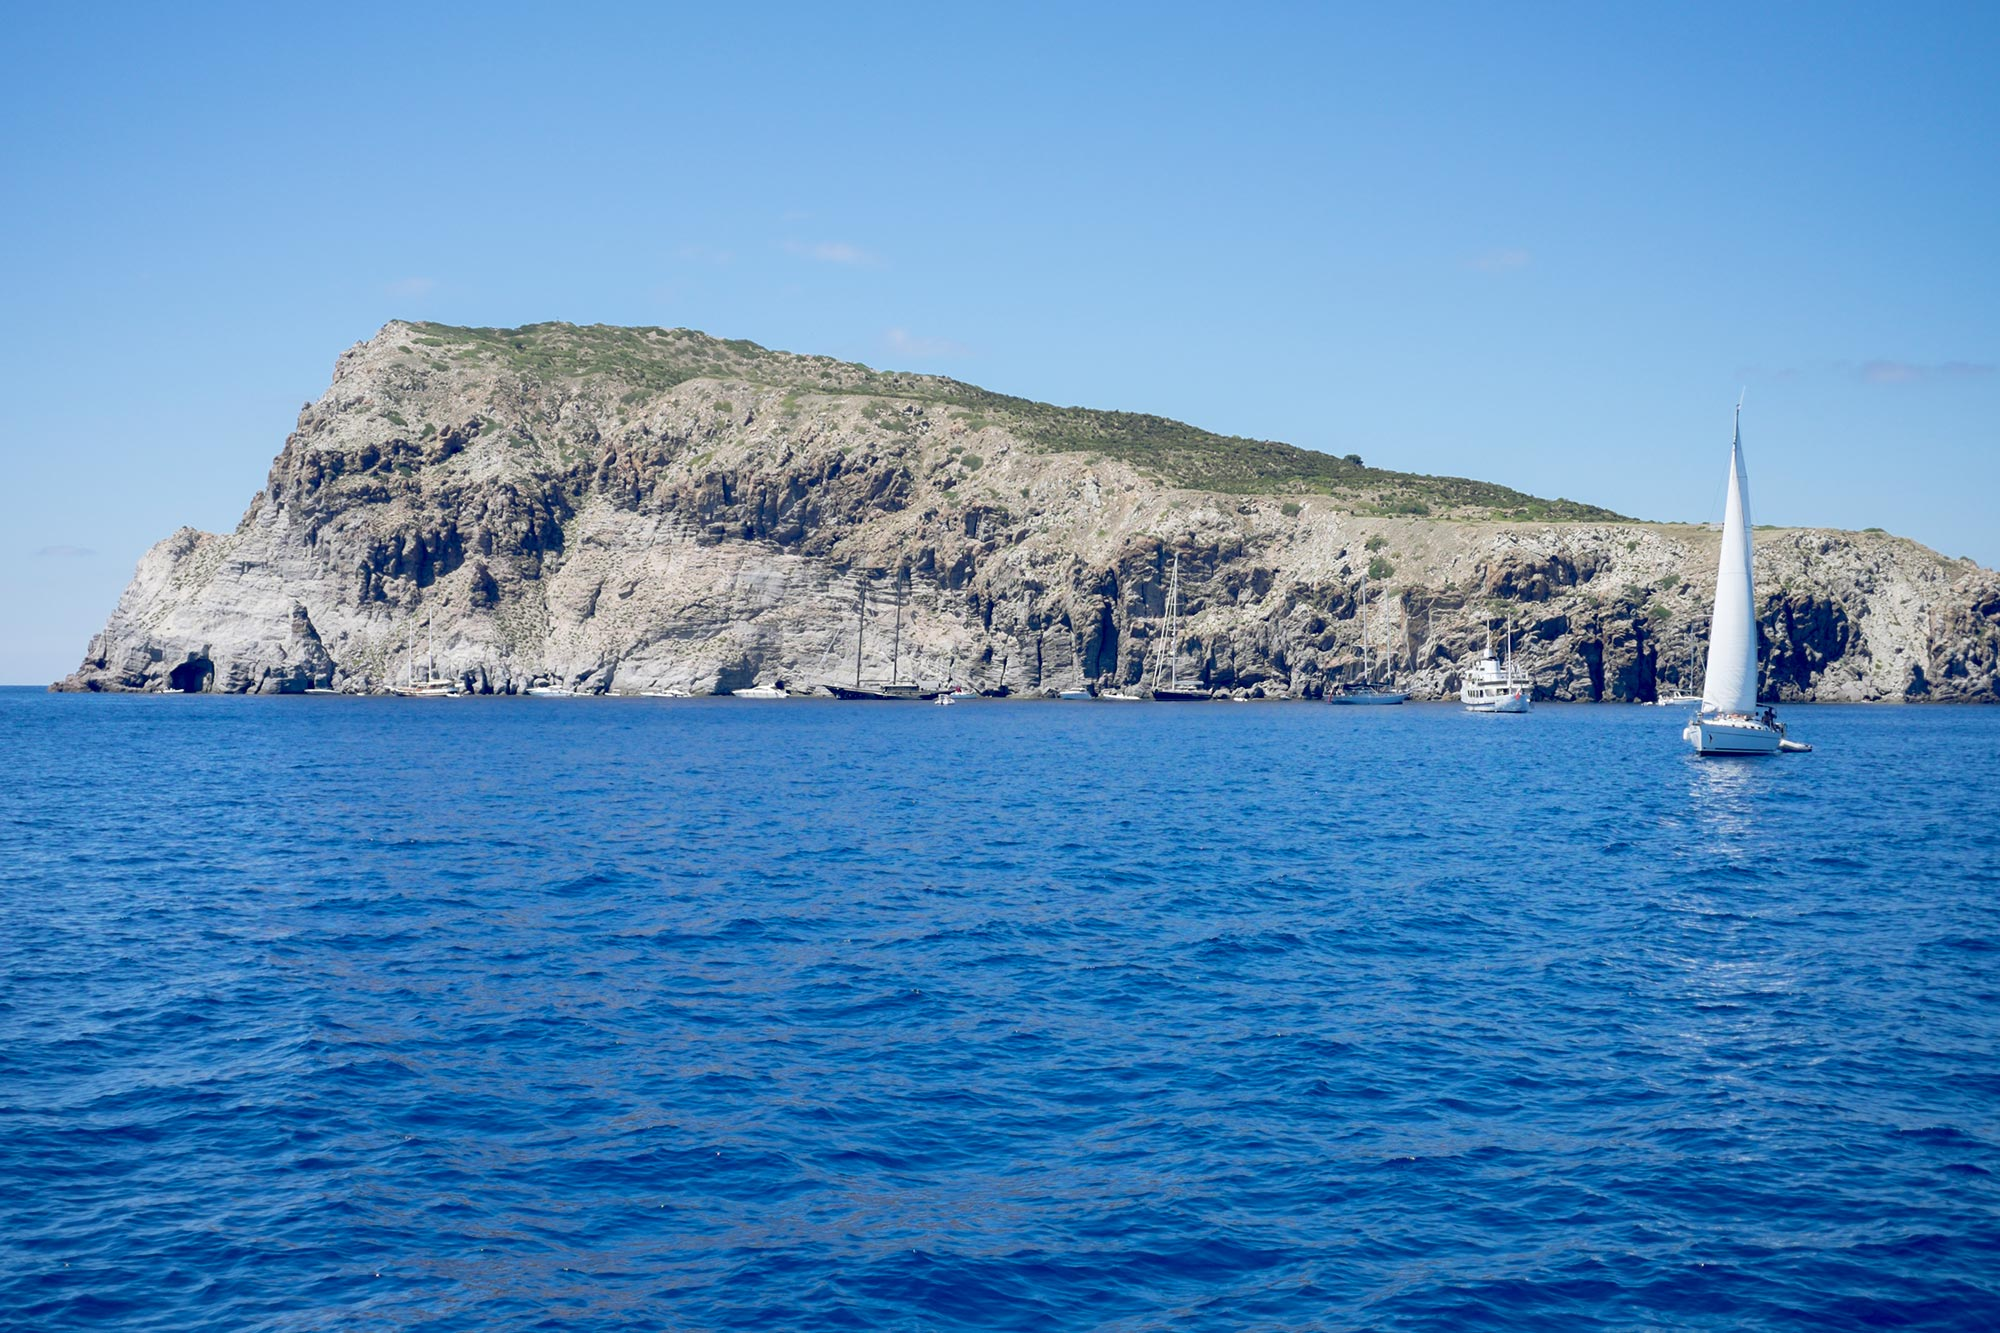 italy-sicilia-eolie-panarea-lisca-bianca